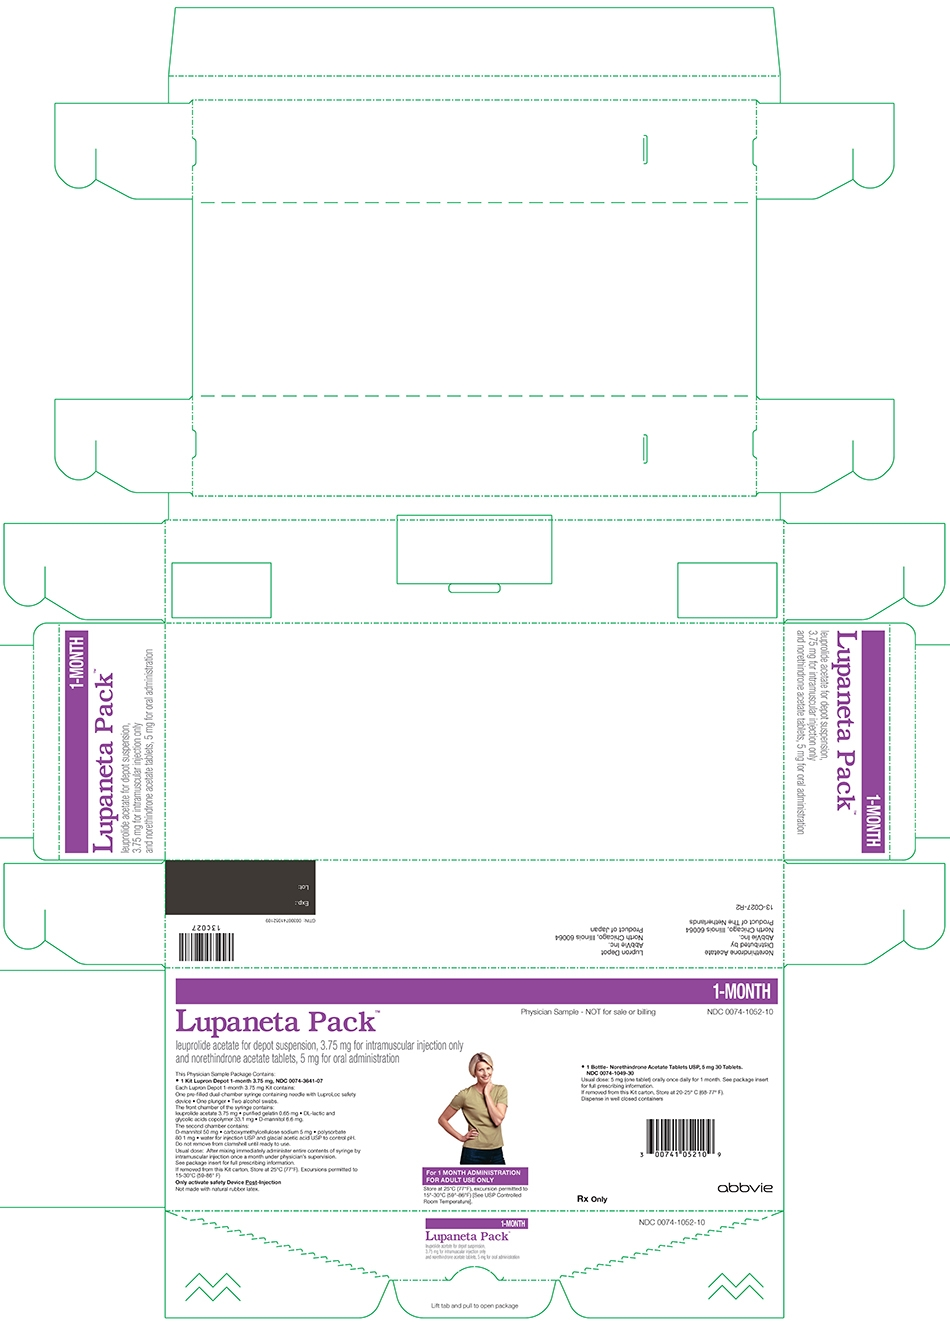 lupaneta pack 3.75 mg 1 month kit sample